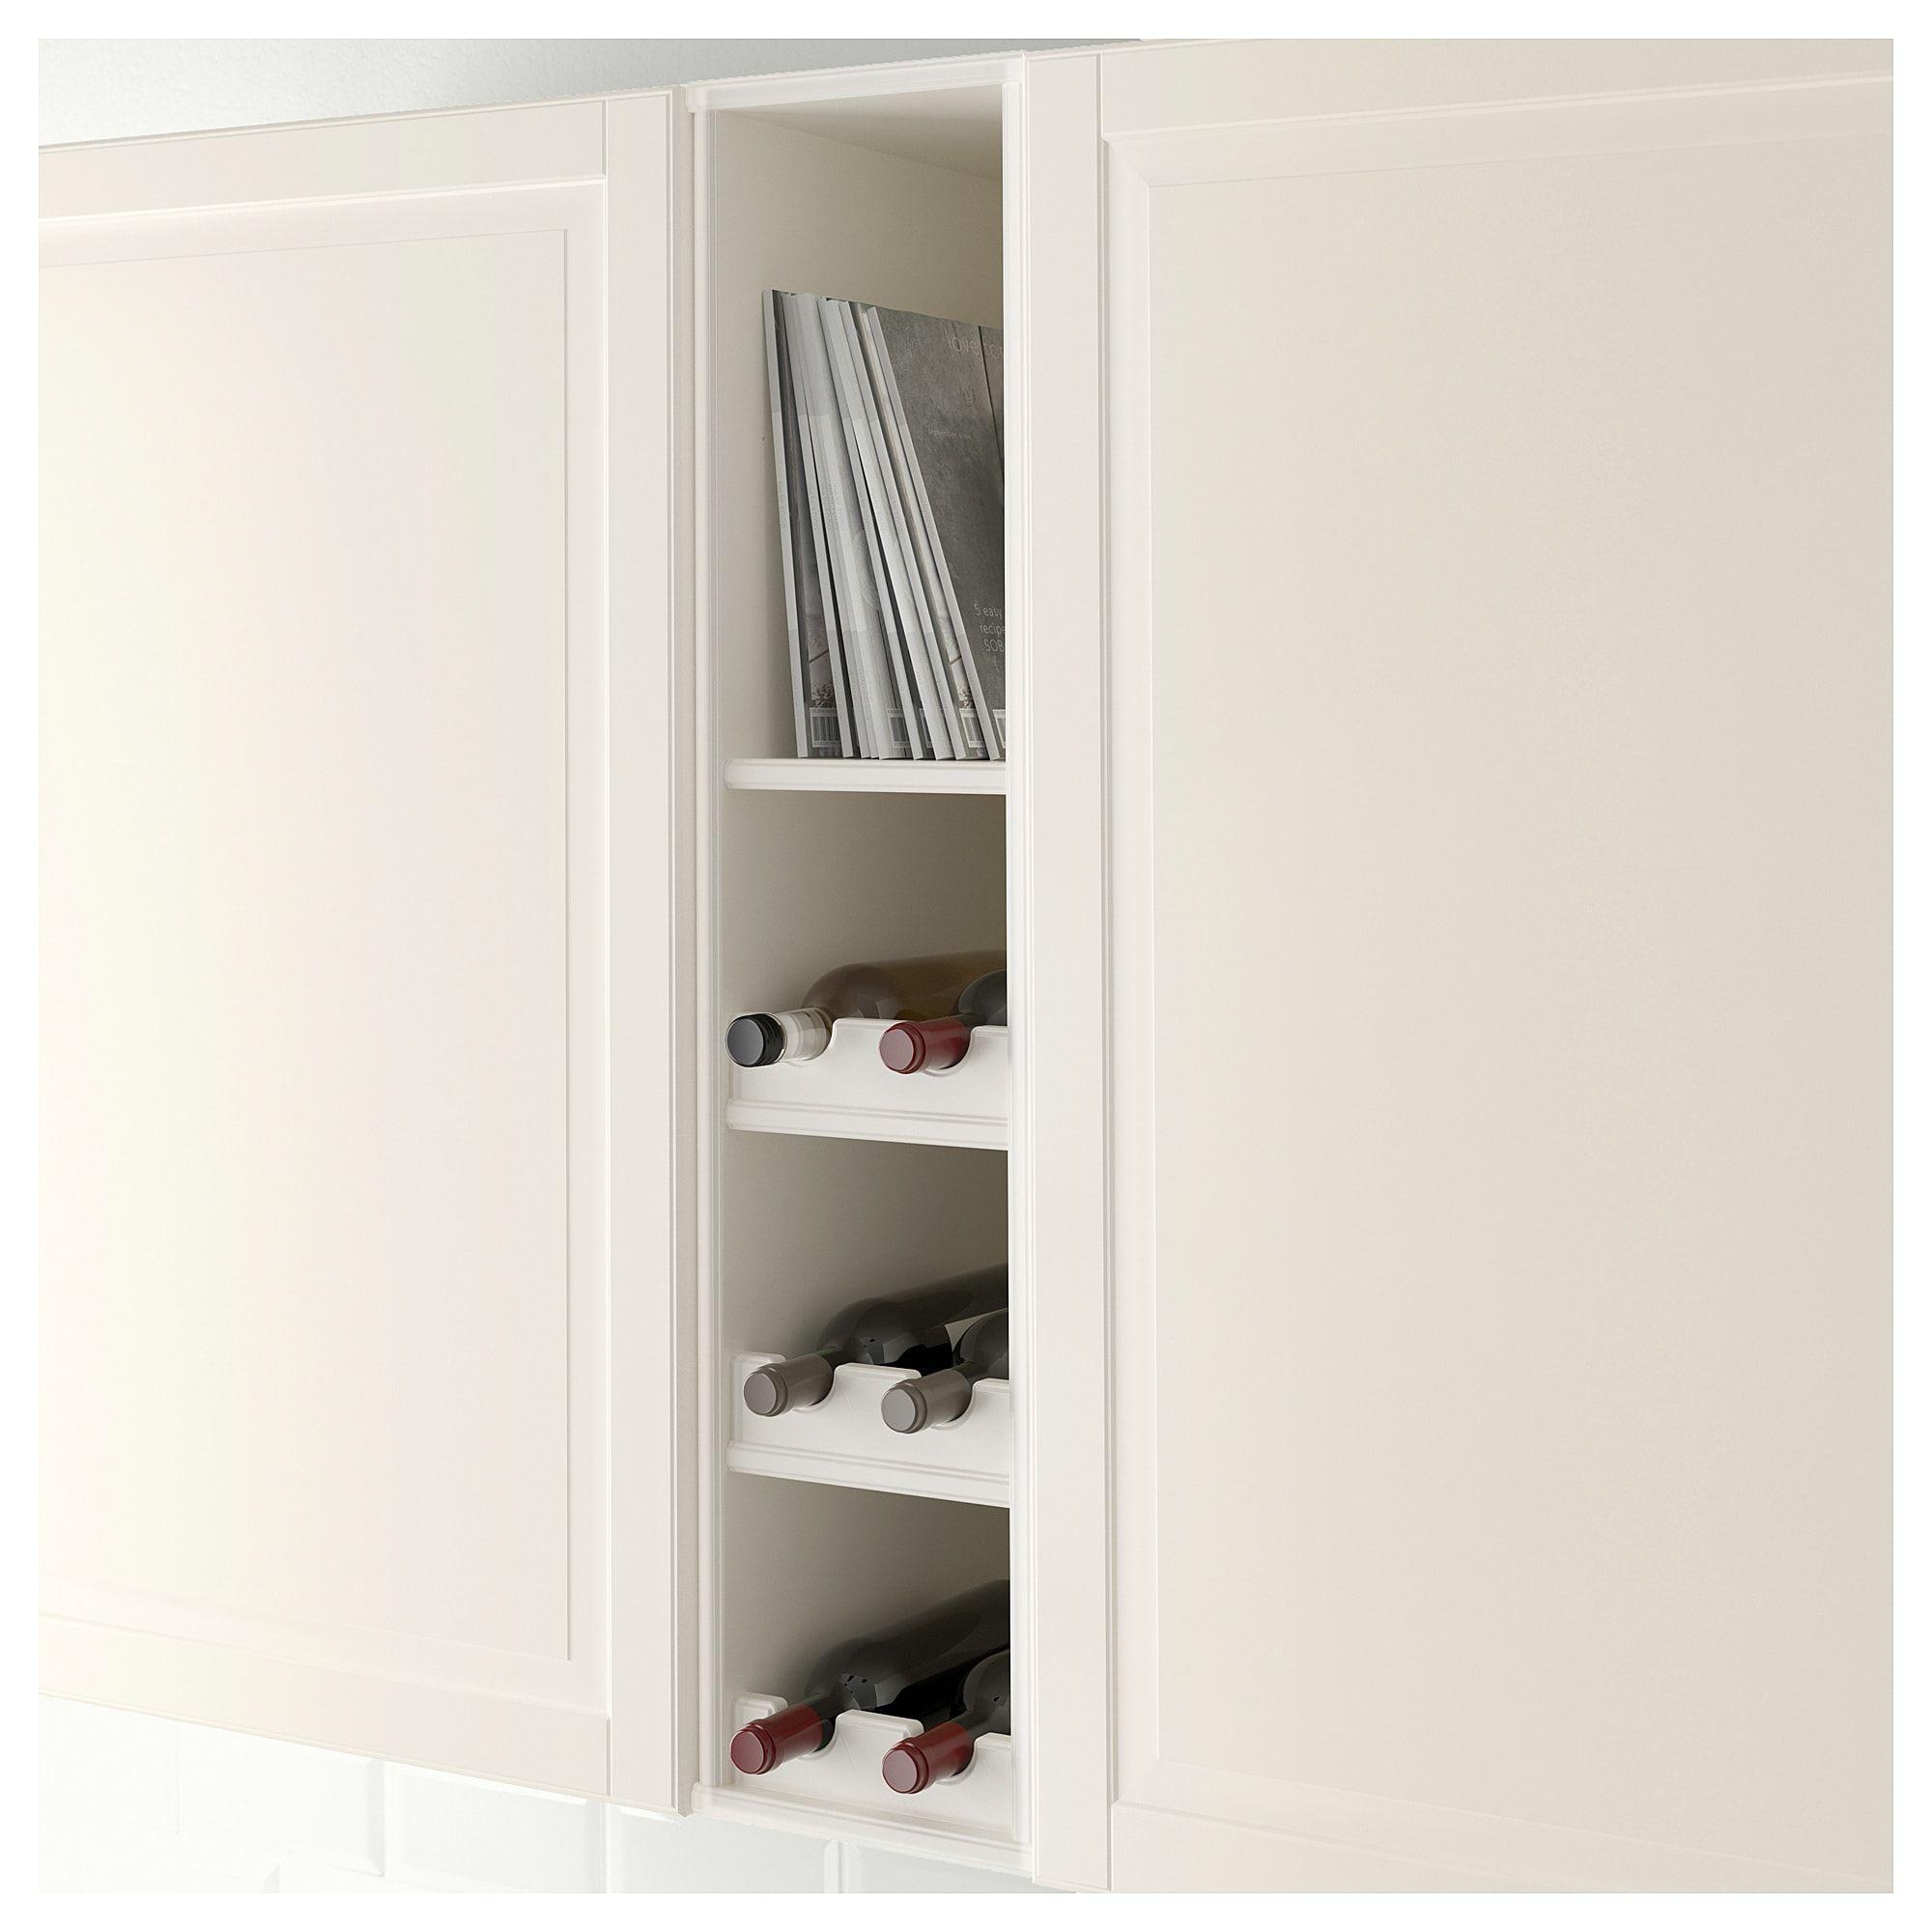 open cabinet tornviken off white house open cabinets tall rh pinterest com